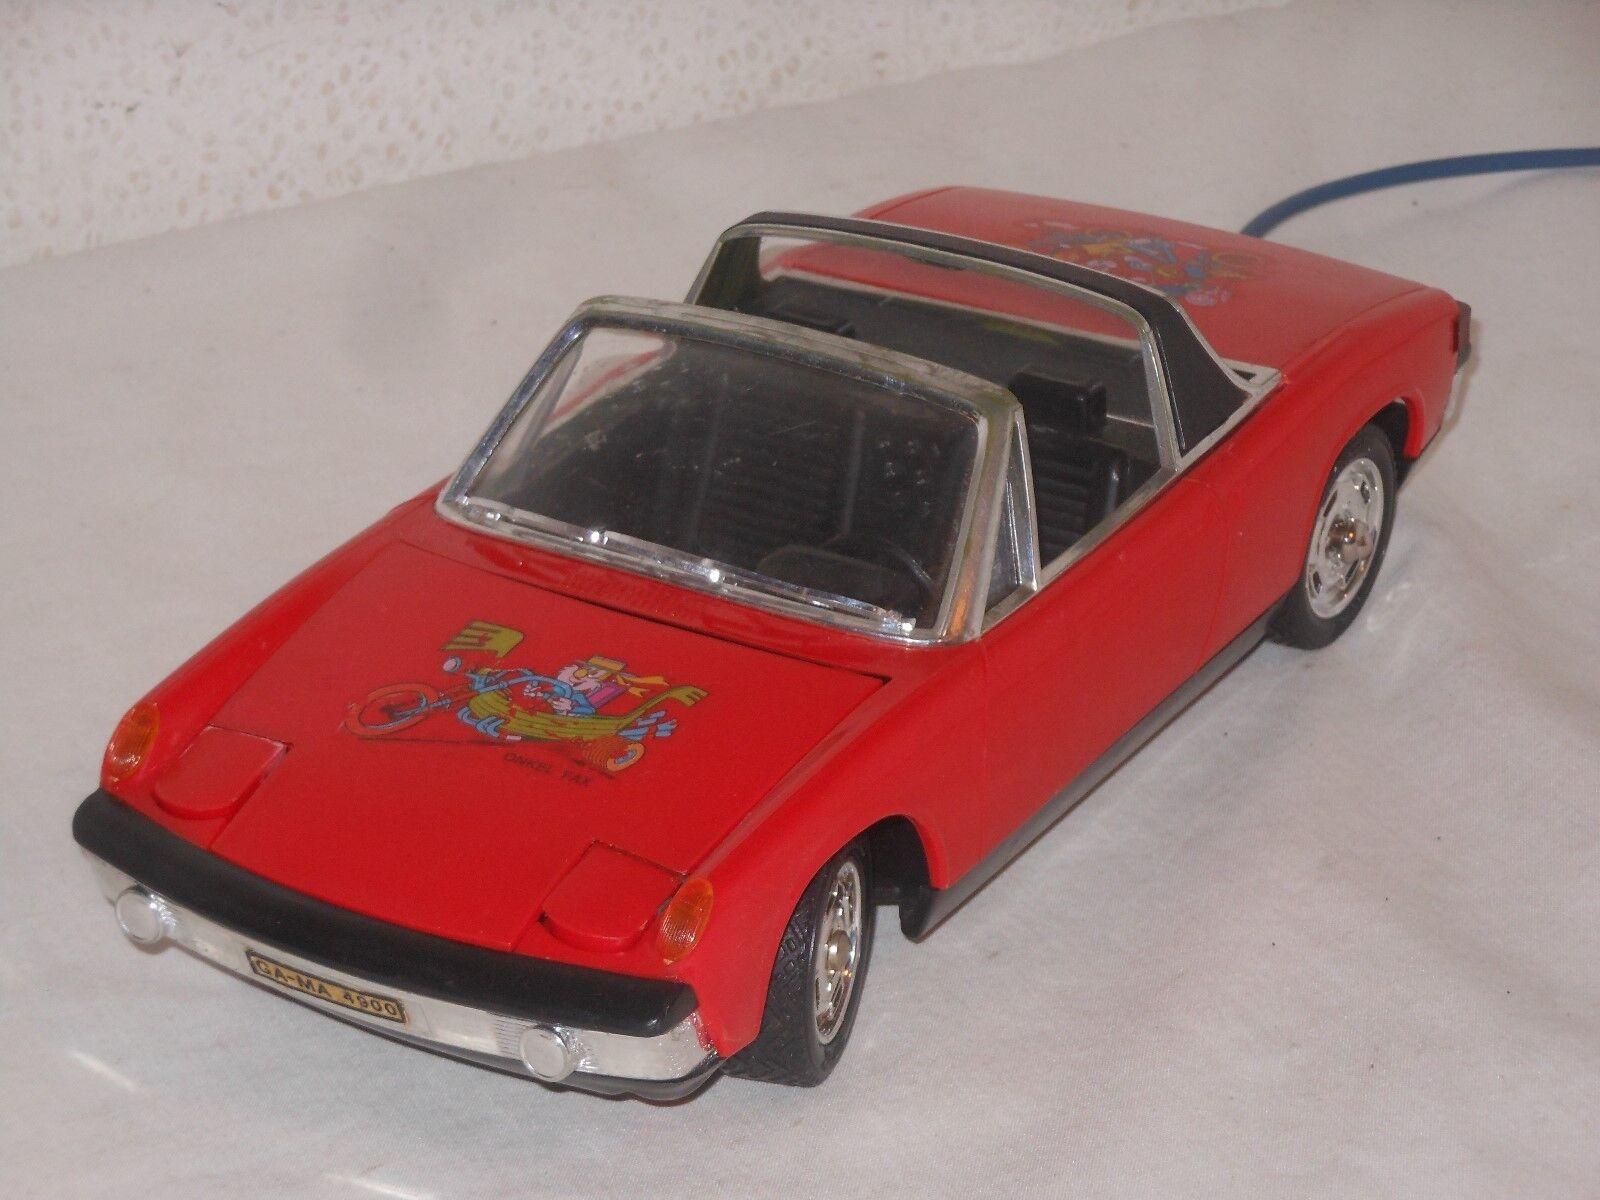 GAMA - VW PORSCHE 914 - 28 cm - VINTAGE TOY - WEST GERMANY - 20